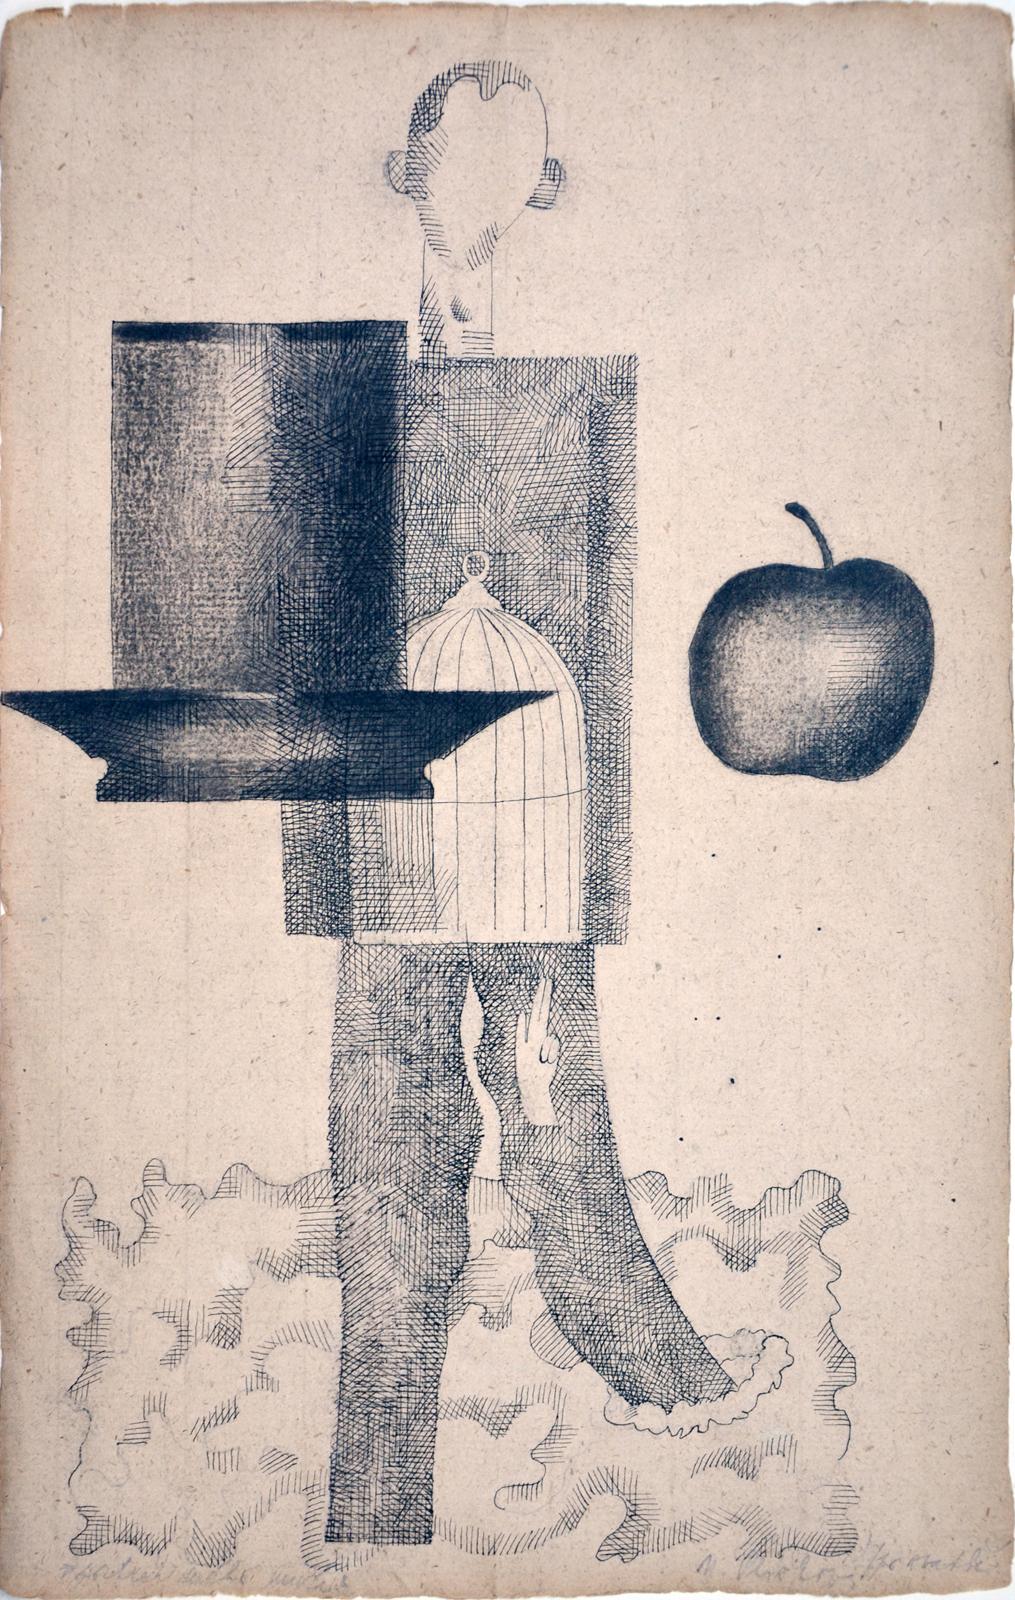 Naděžda Plíšková, Portrét mého muže (po svatbě), kresba tuší, 37 × 23 cm, 1964